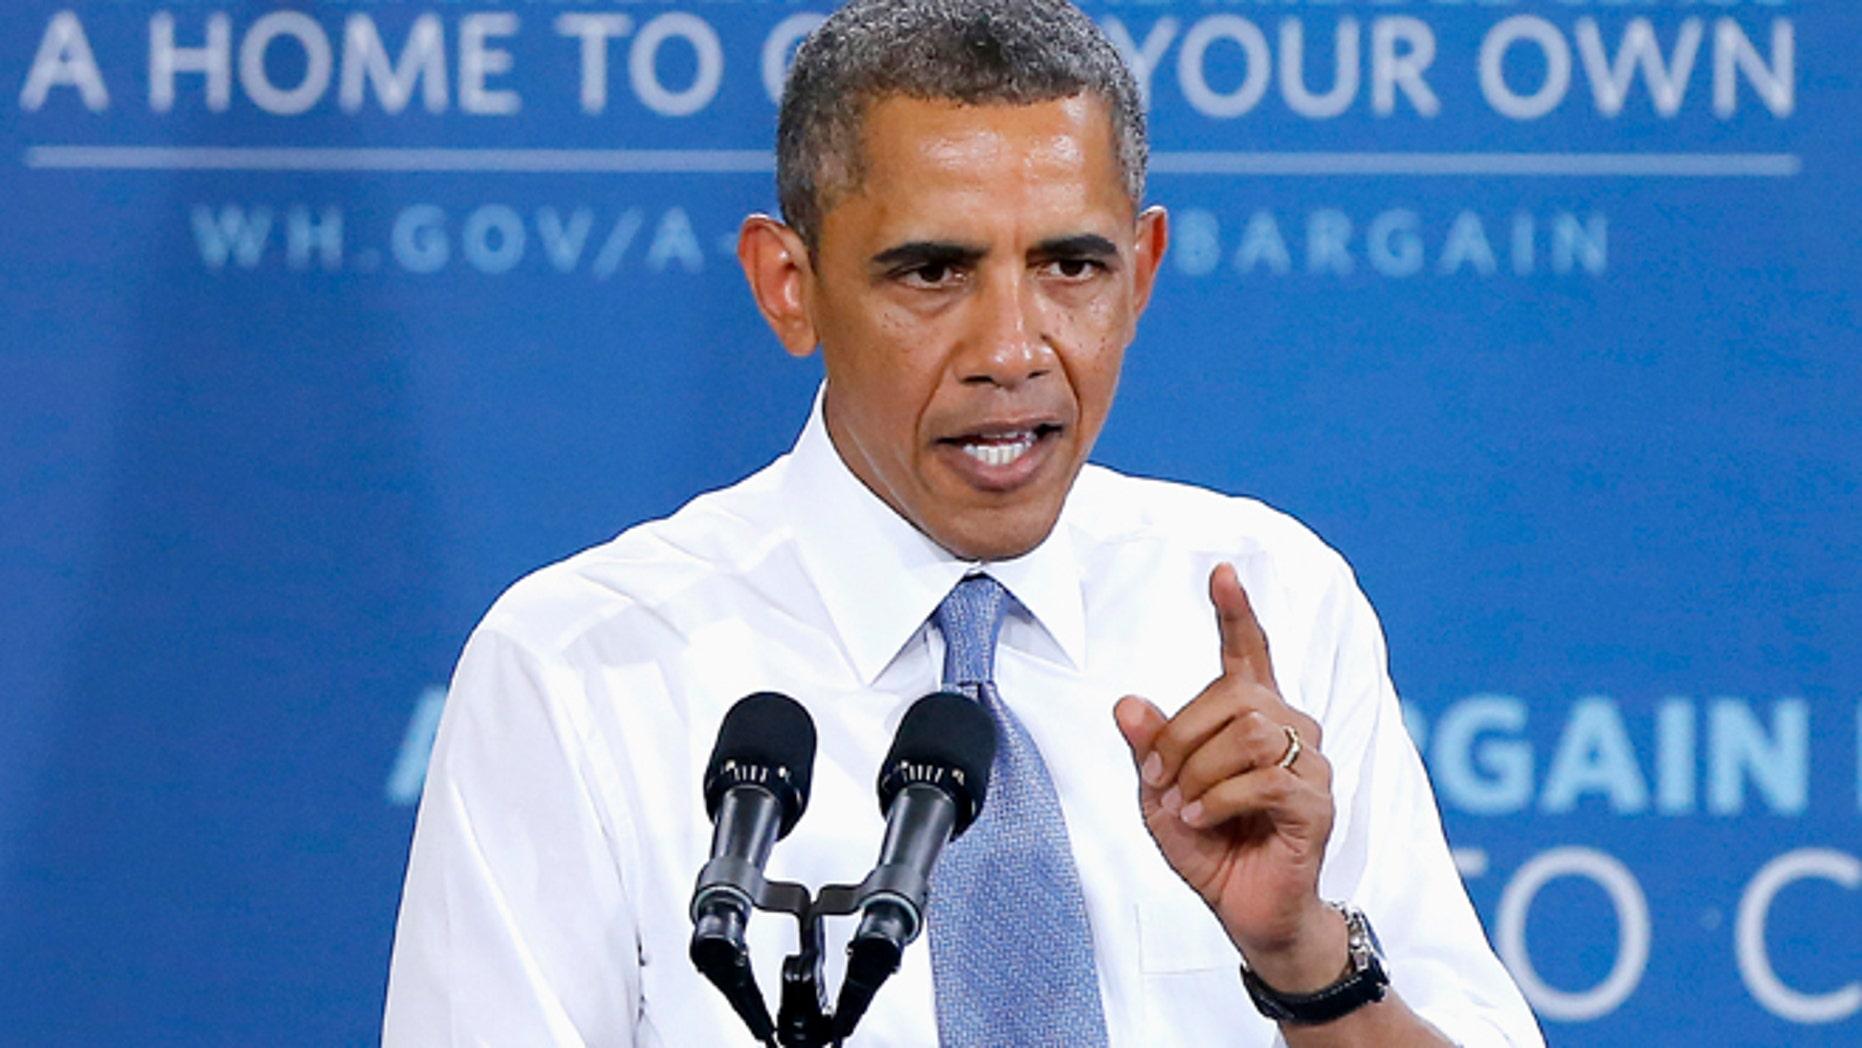 Aug 6, 2013: President Barack Obama speaks about housing in Phoenix.